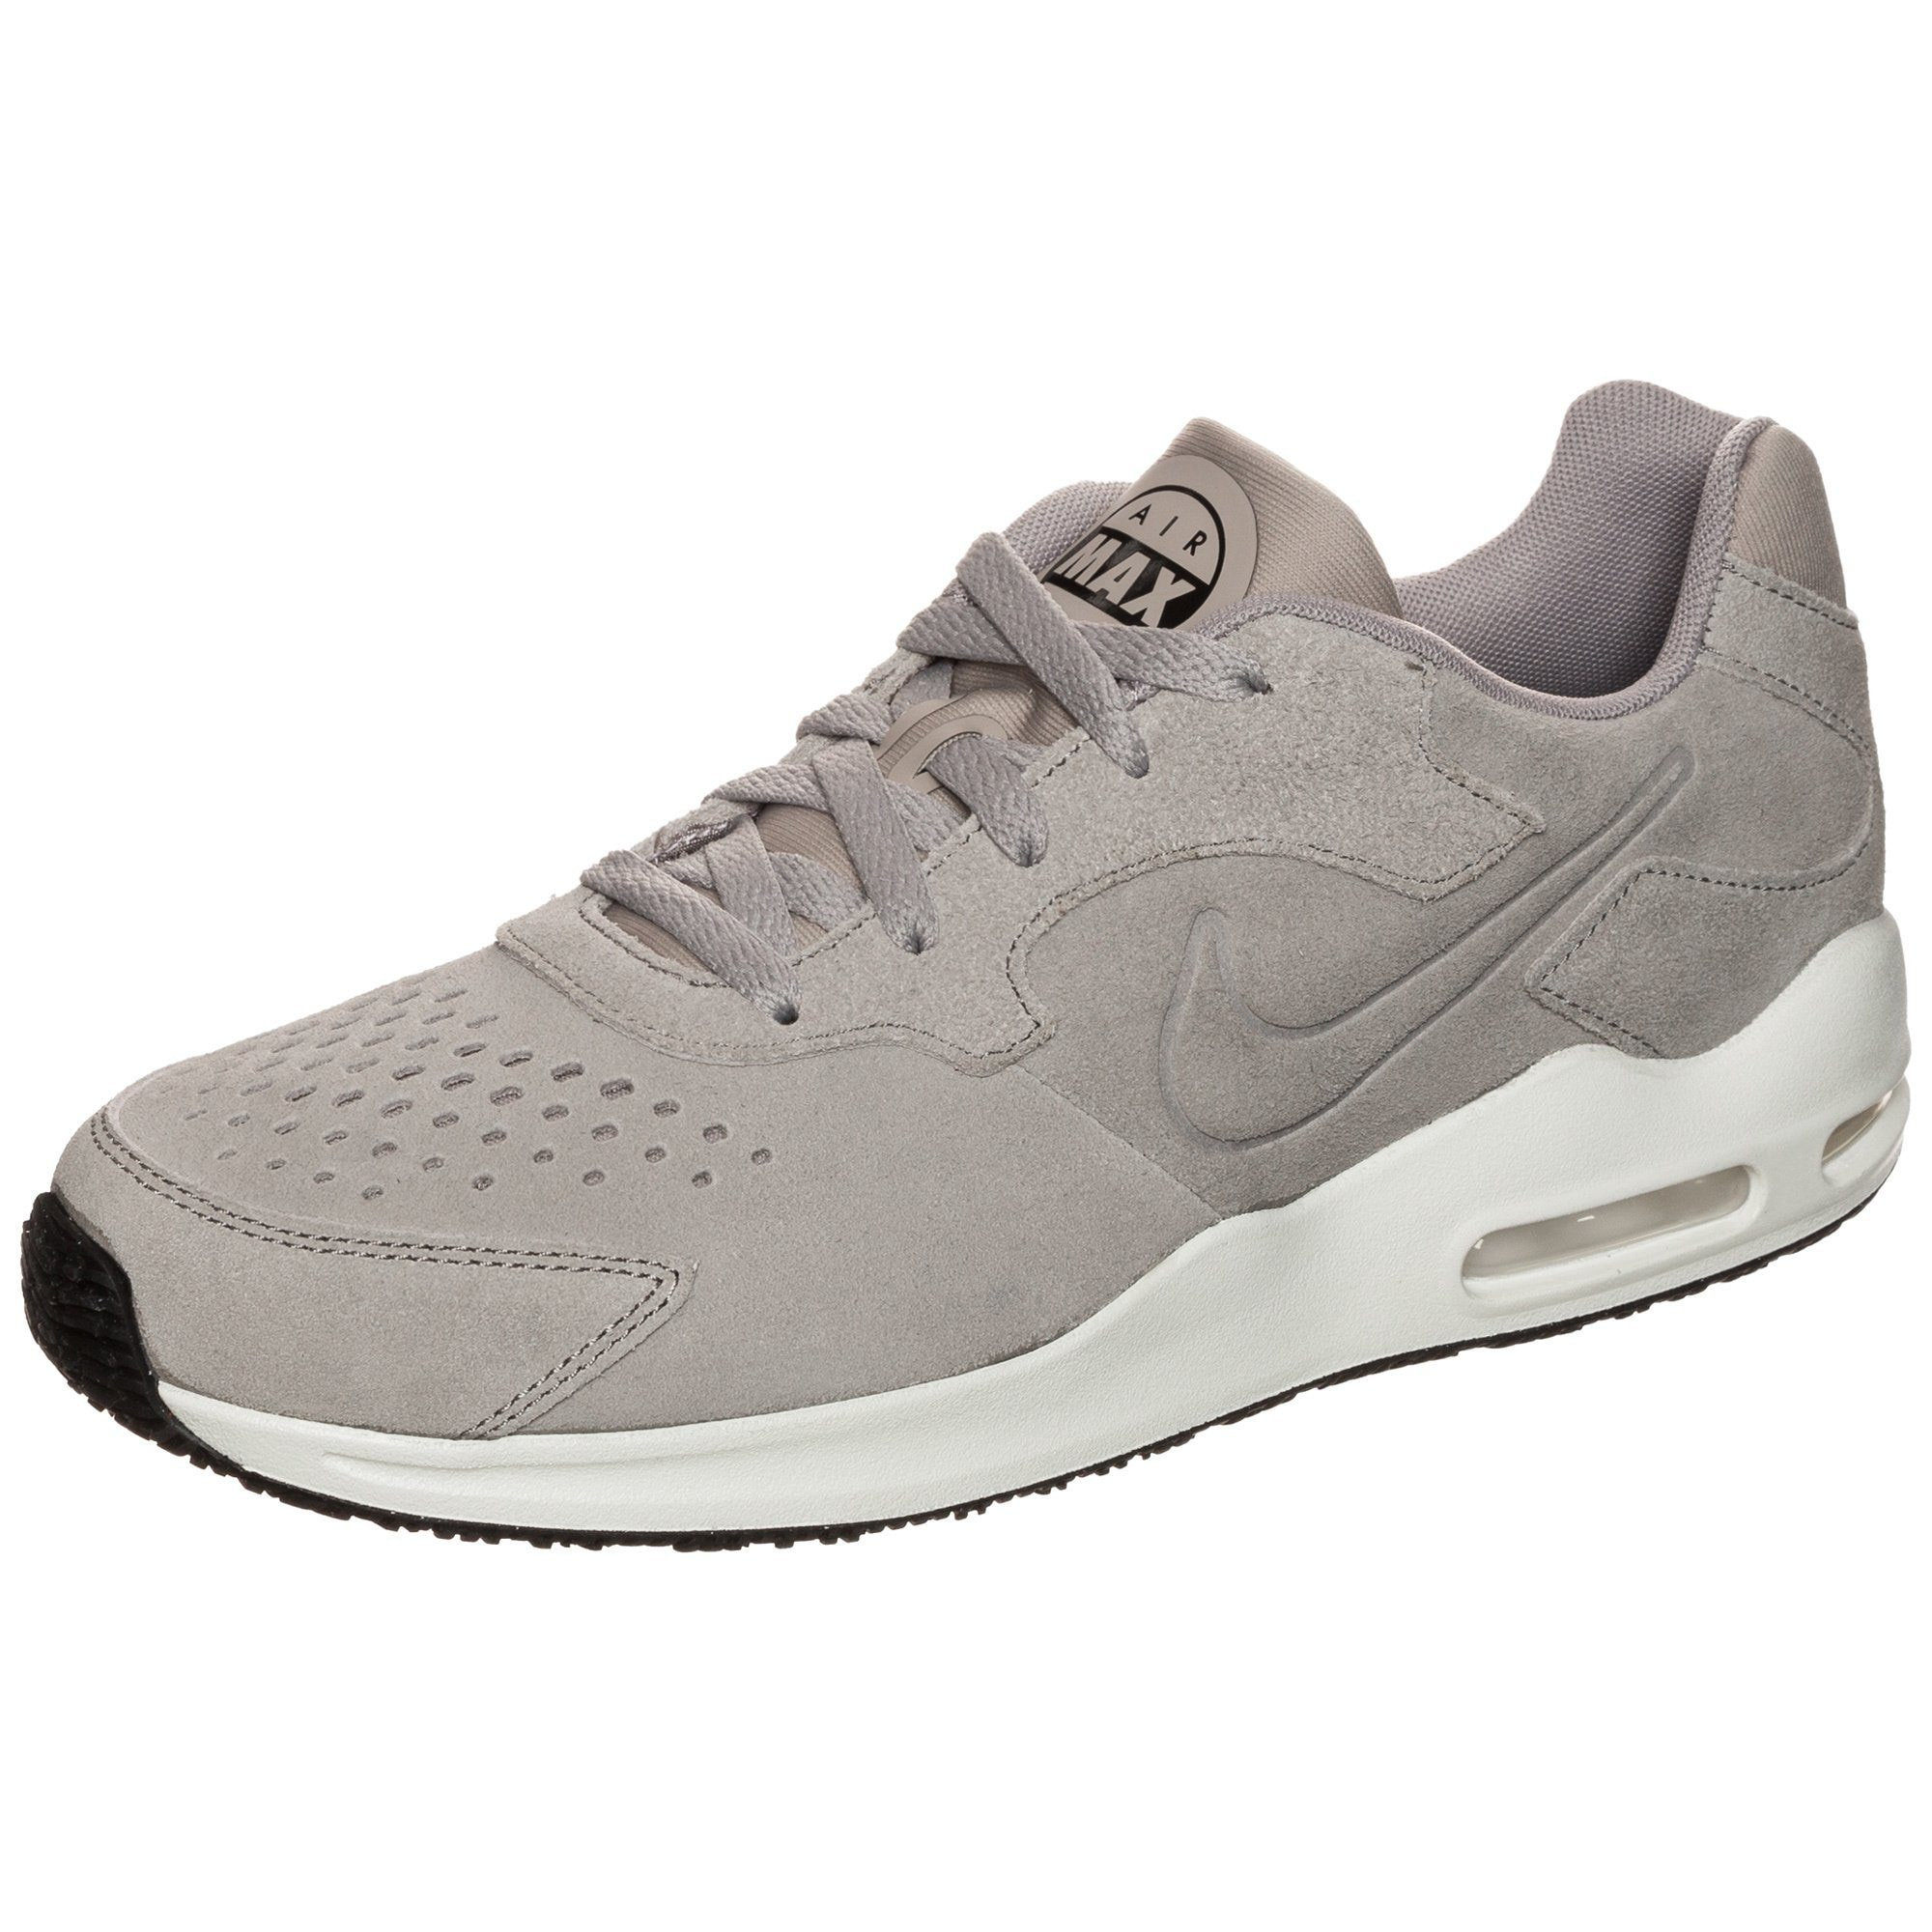 Nike Sportswear Sneaker Air Max Guile Premium per Rechnung | Gutes Preis-Leistungs-Verhältnis, es lohnt sich